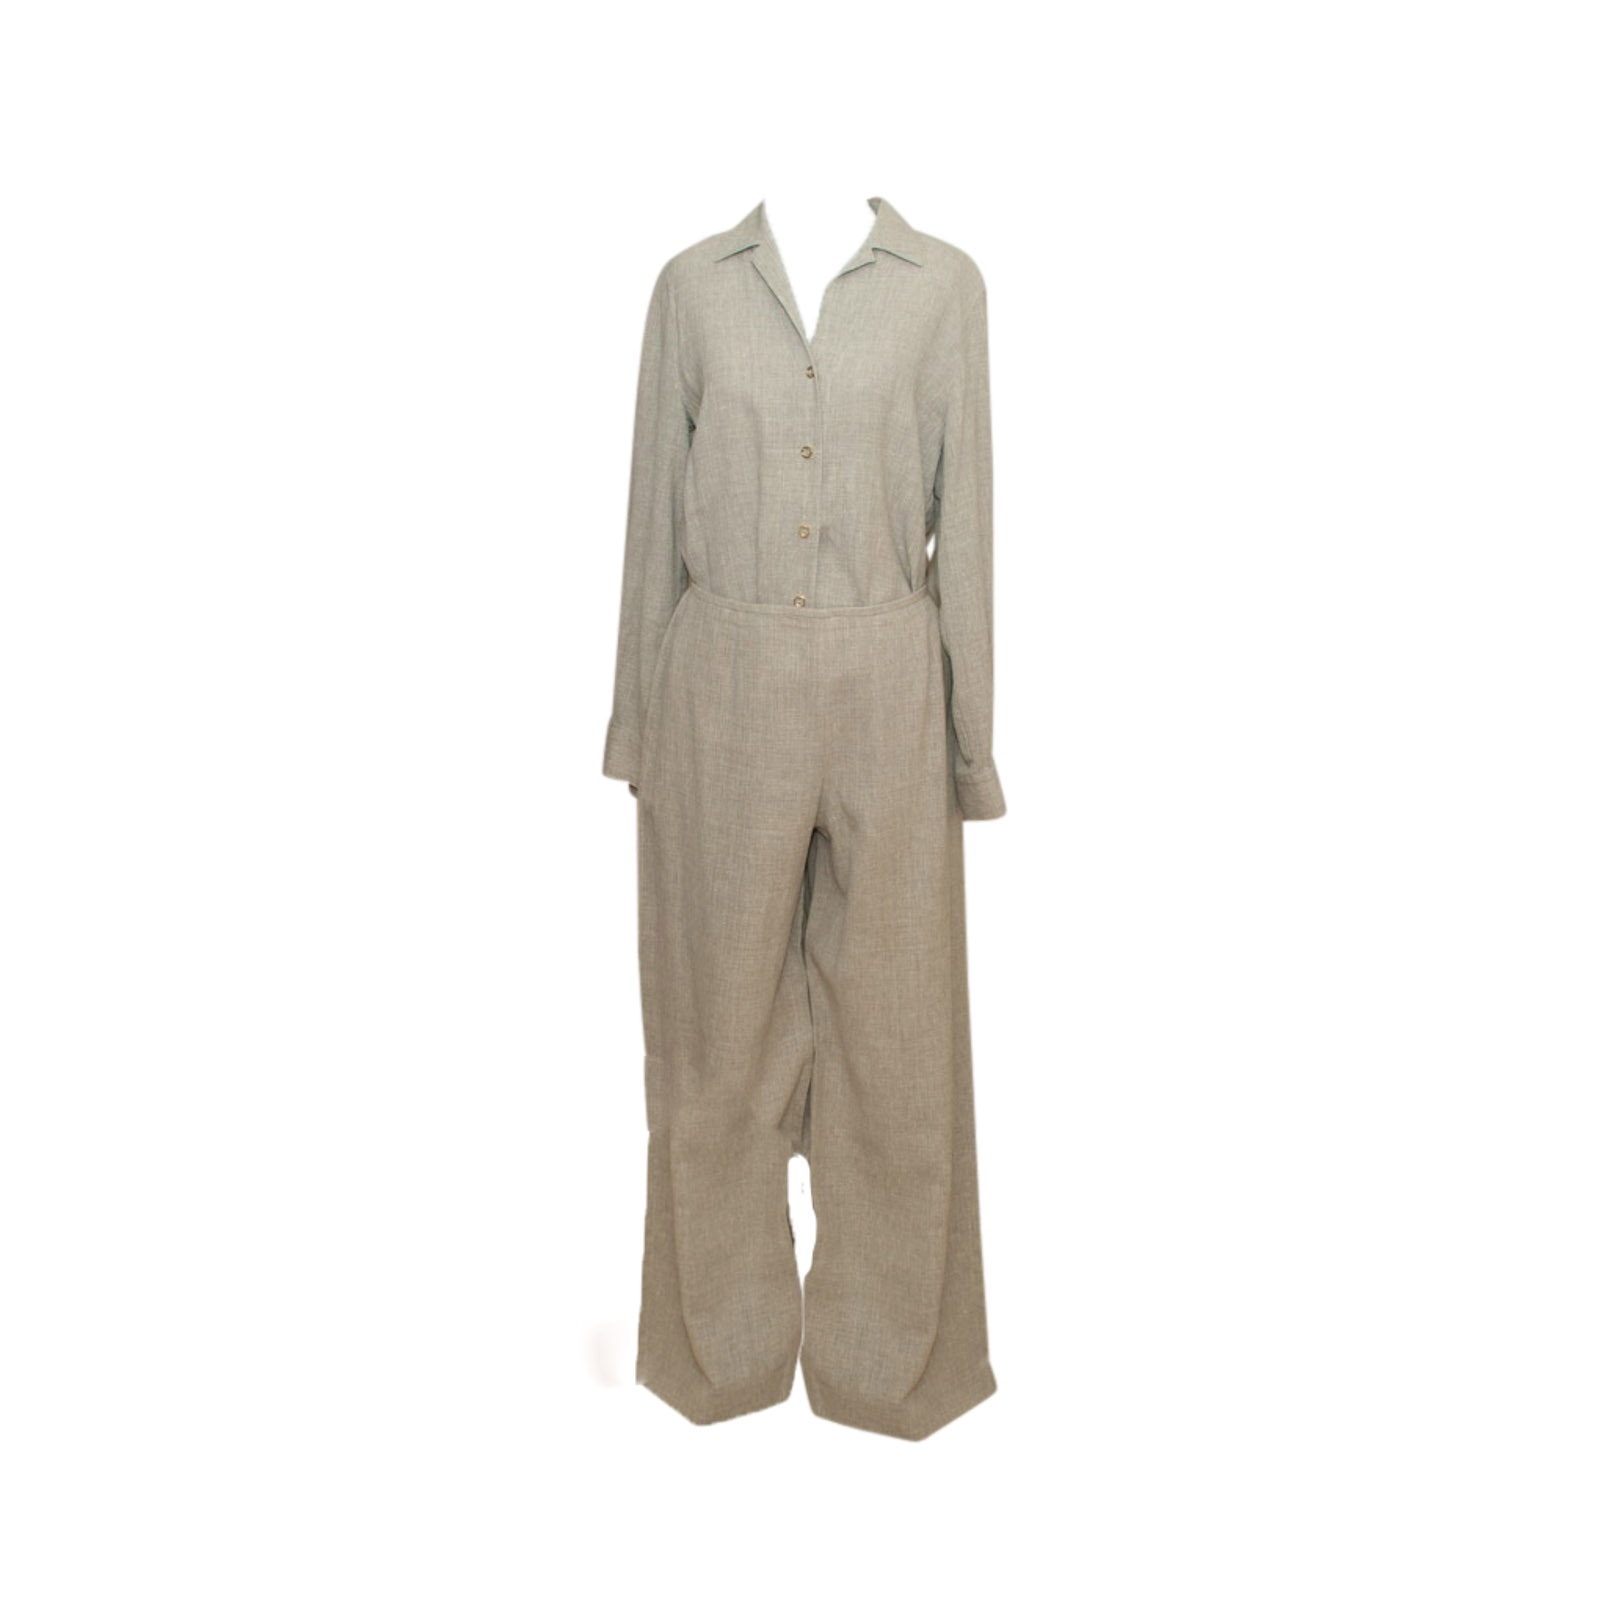 Women's Escada Two-Piece Set in Linen and Wool Blend